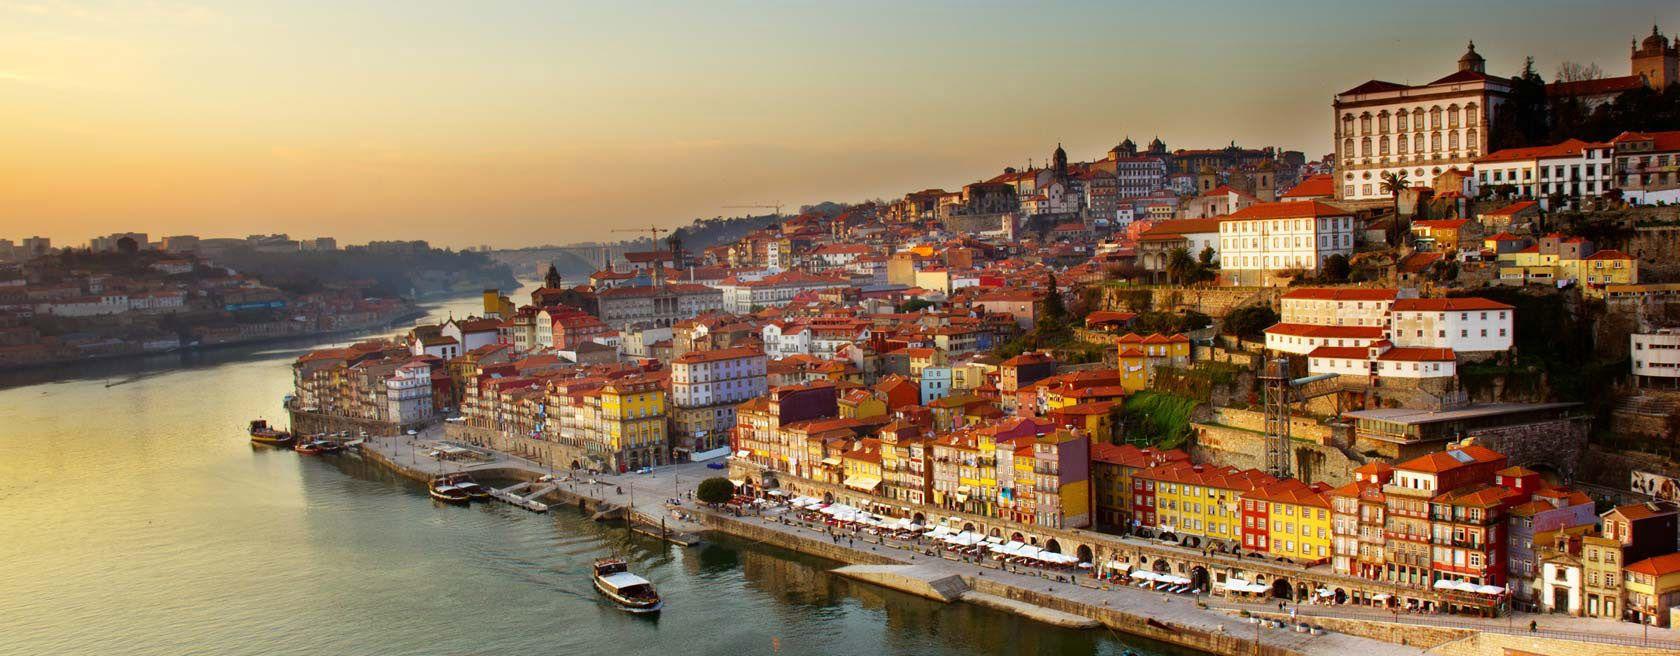 Porto Portugal Portugal Reisen Urlaub Tourismus